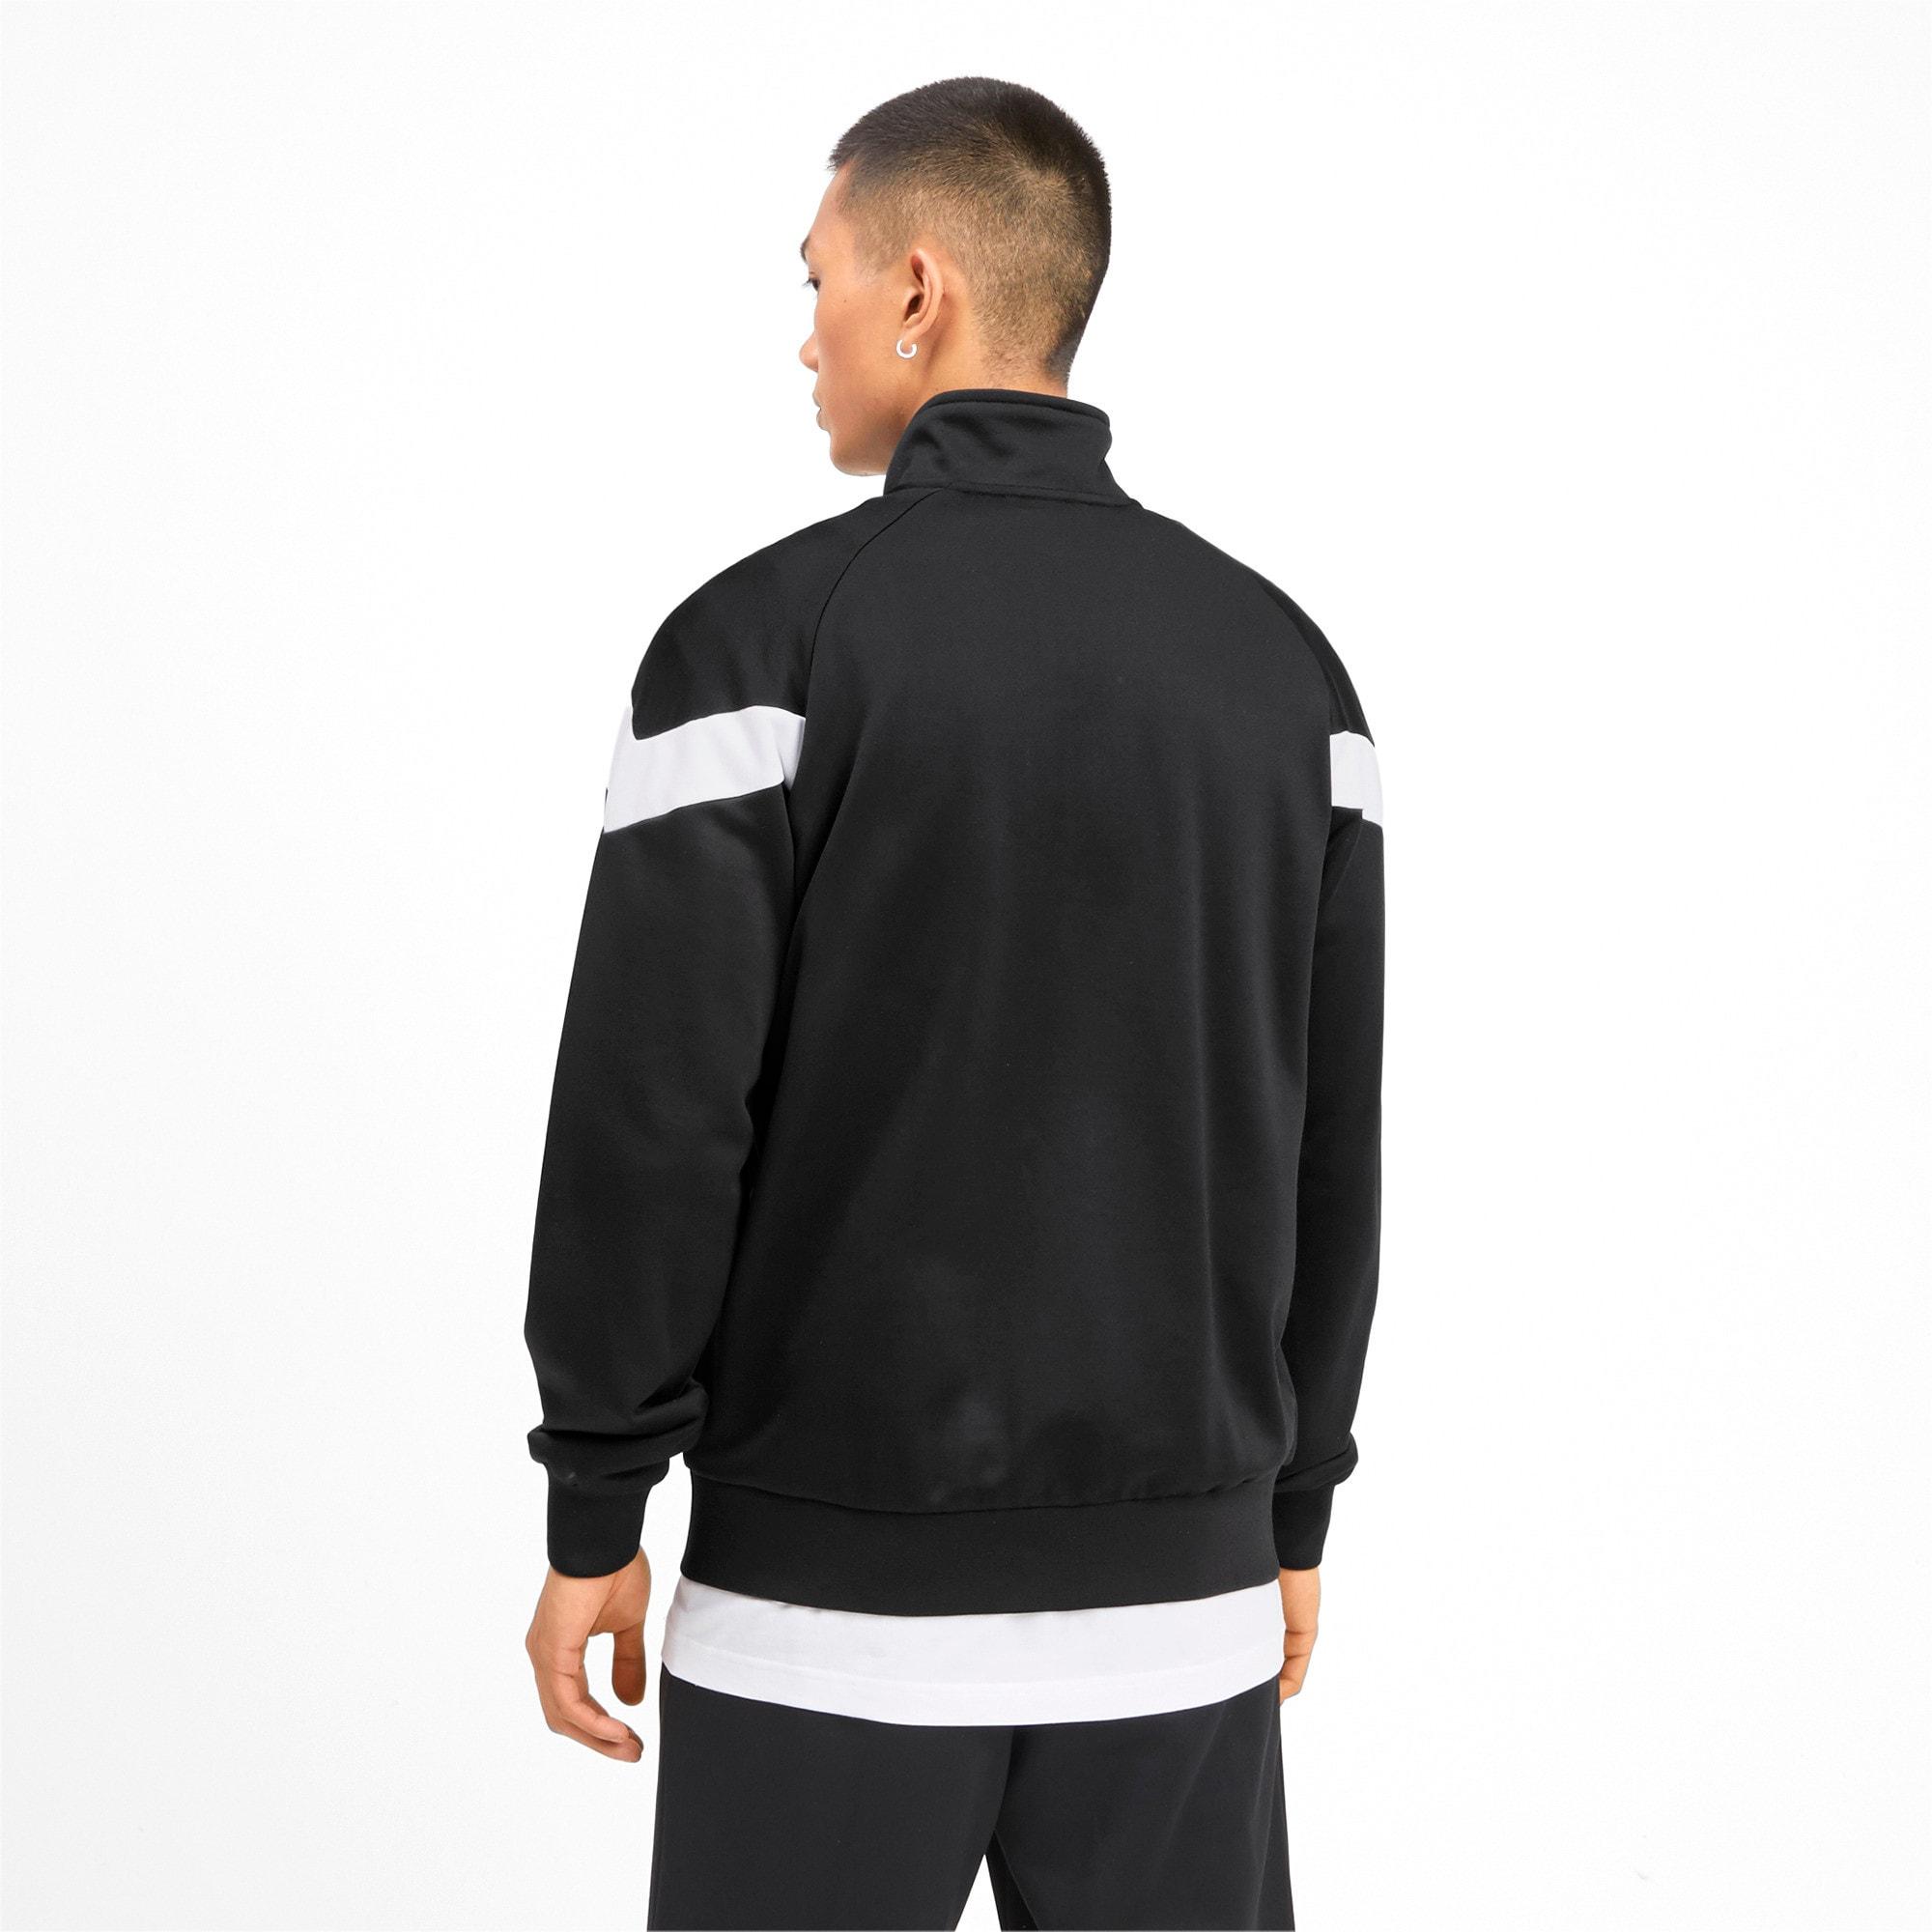 Thumbnail 3 of Iconic MCS Men's Track Jacket, Puma Black, medium